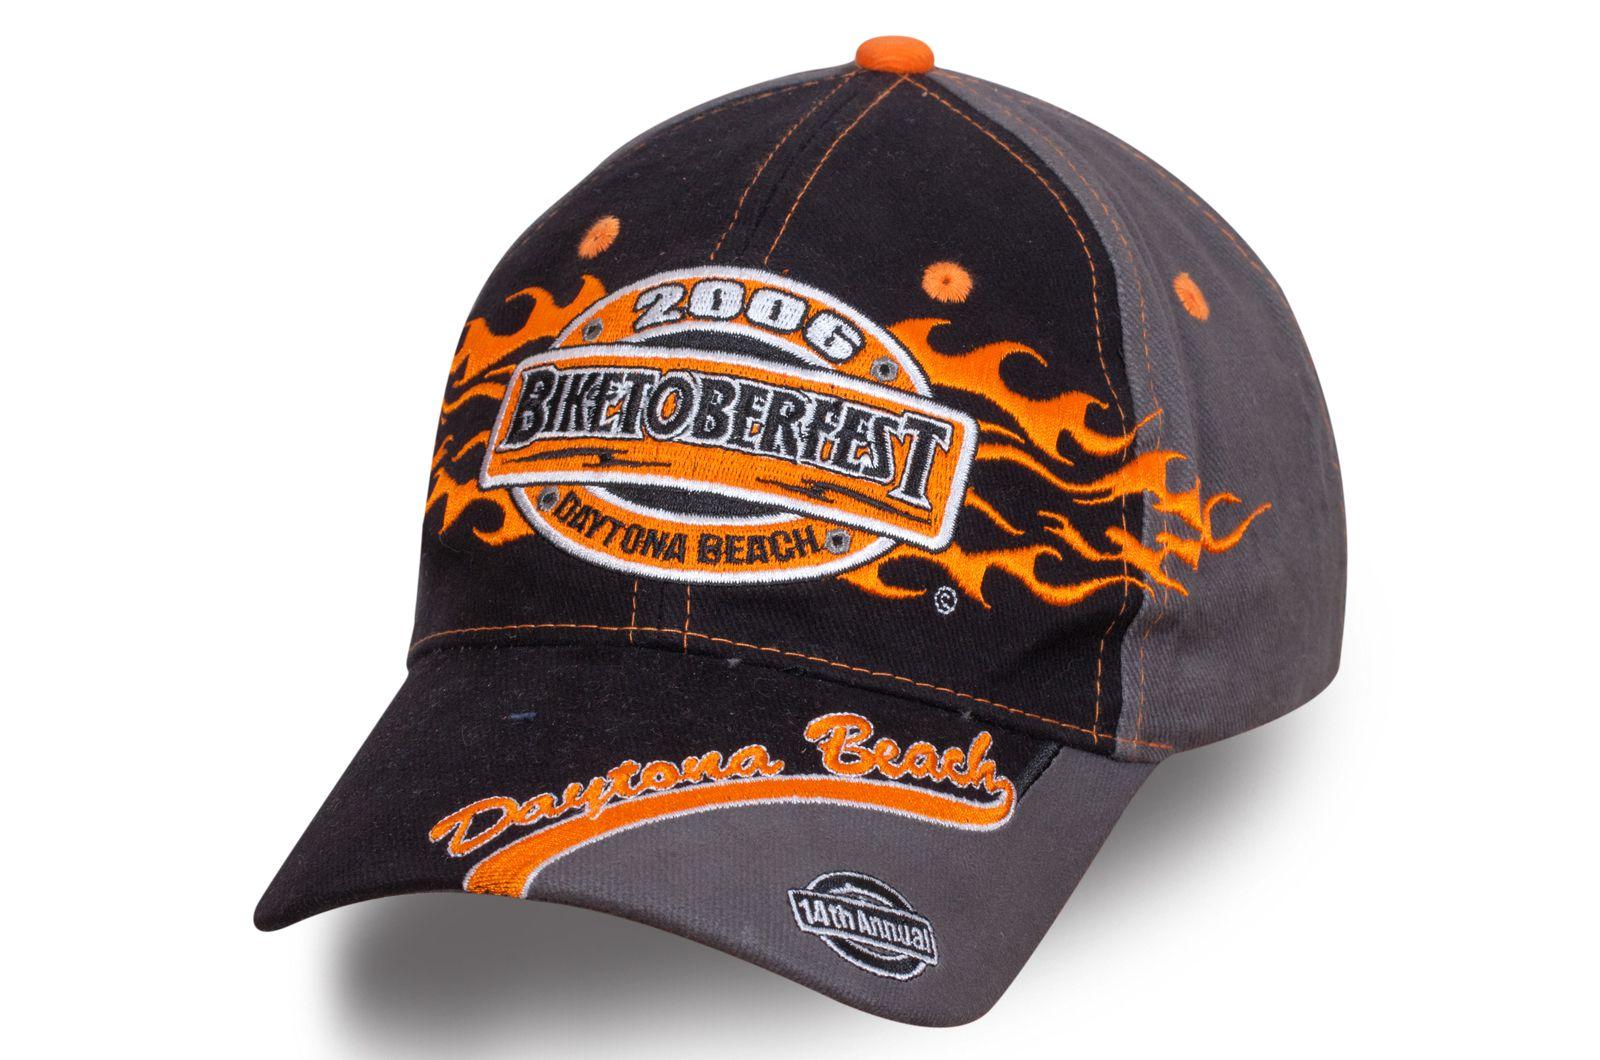 Байкерская бейсболка Biketoberfest